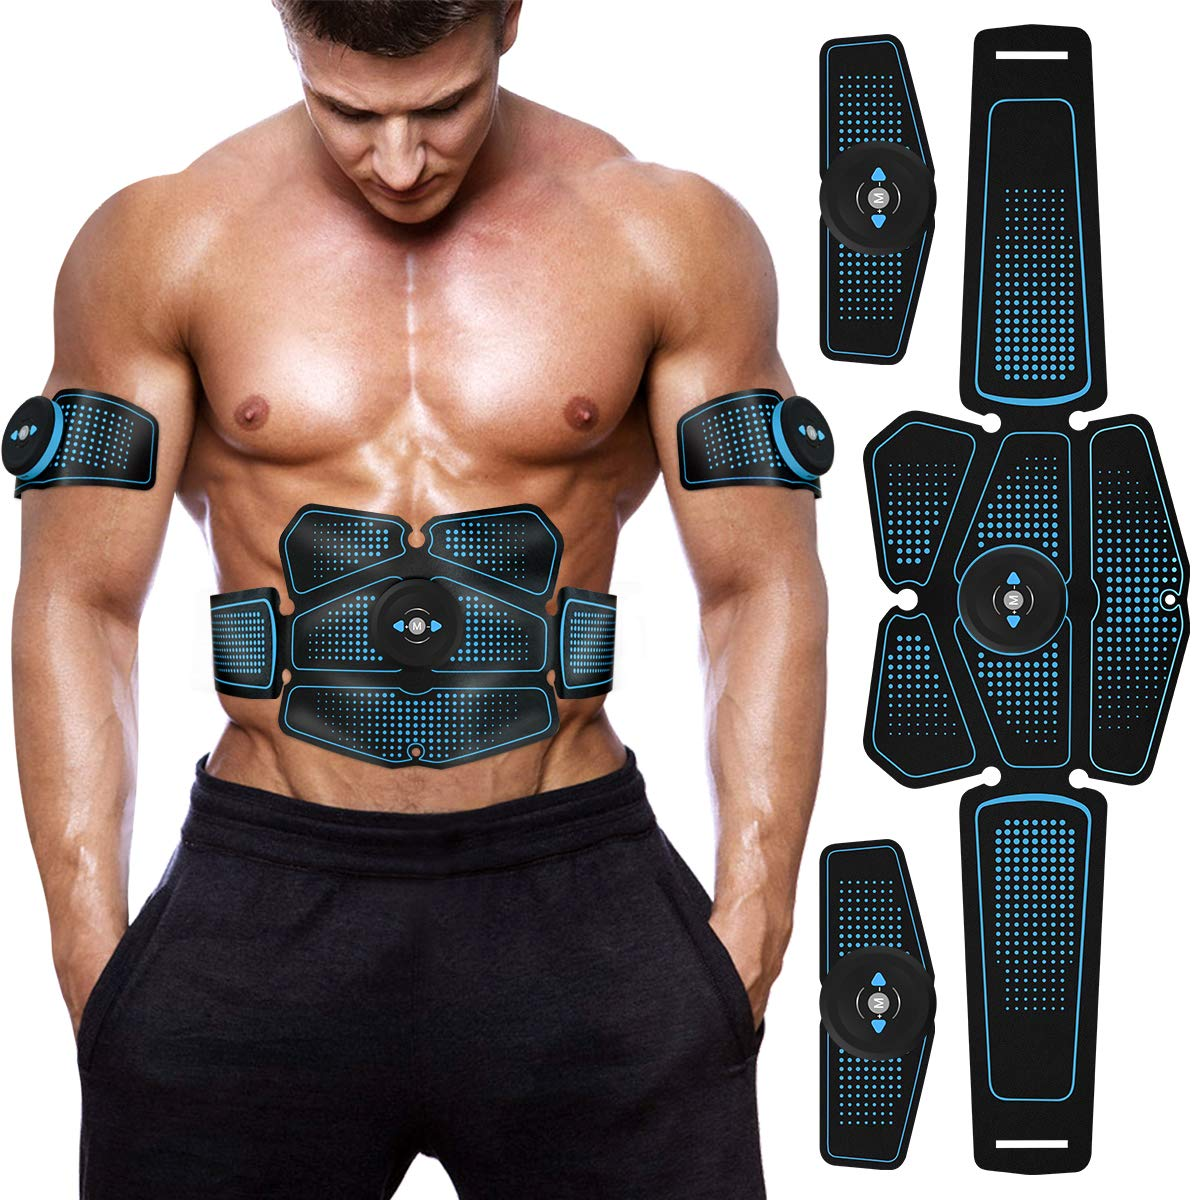 Body Building Equipamentos de Fitness Muscular Elétrica Máquina De Toner Toning Belt 6 Six Pack Abs Sem Fio Queimador de Gordura